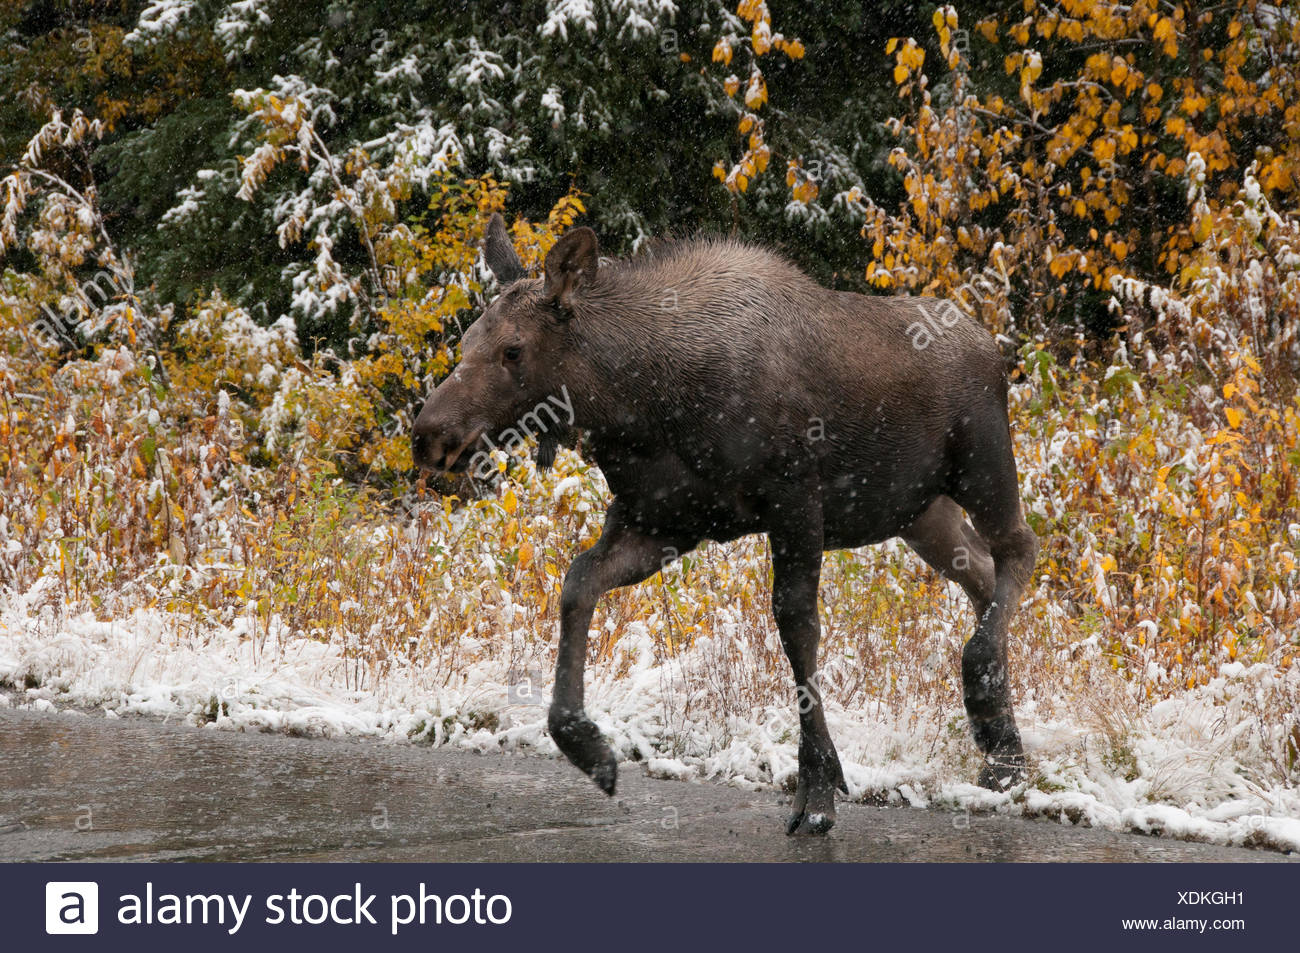 Moose calf (Alces alces) crossing wet, icy highway in first snows of winter season.  Alaska Hwy, Alaska. - Stock Image